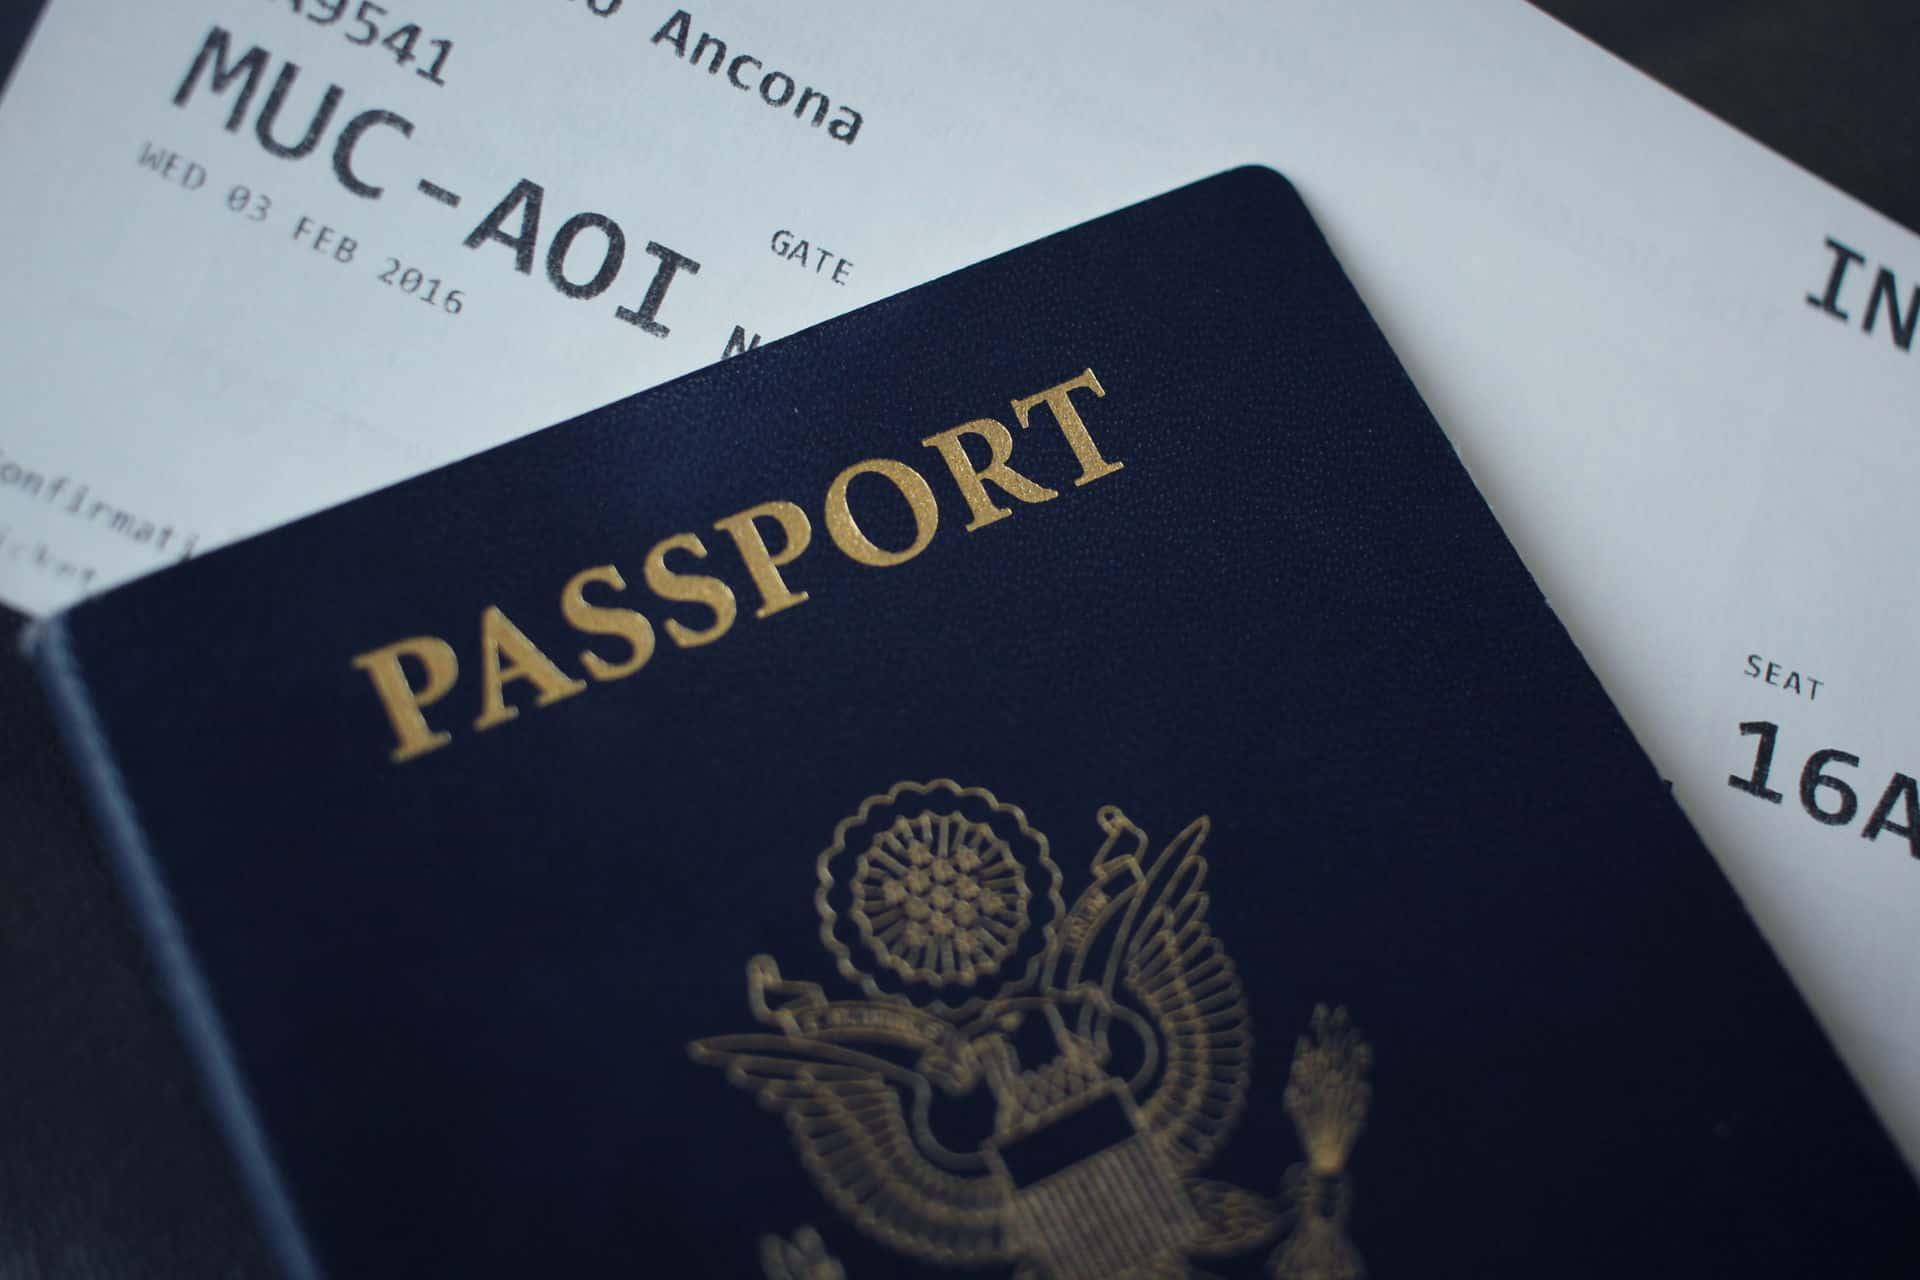 Booking error fares to travel - passport